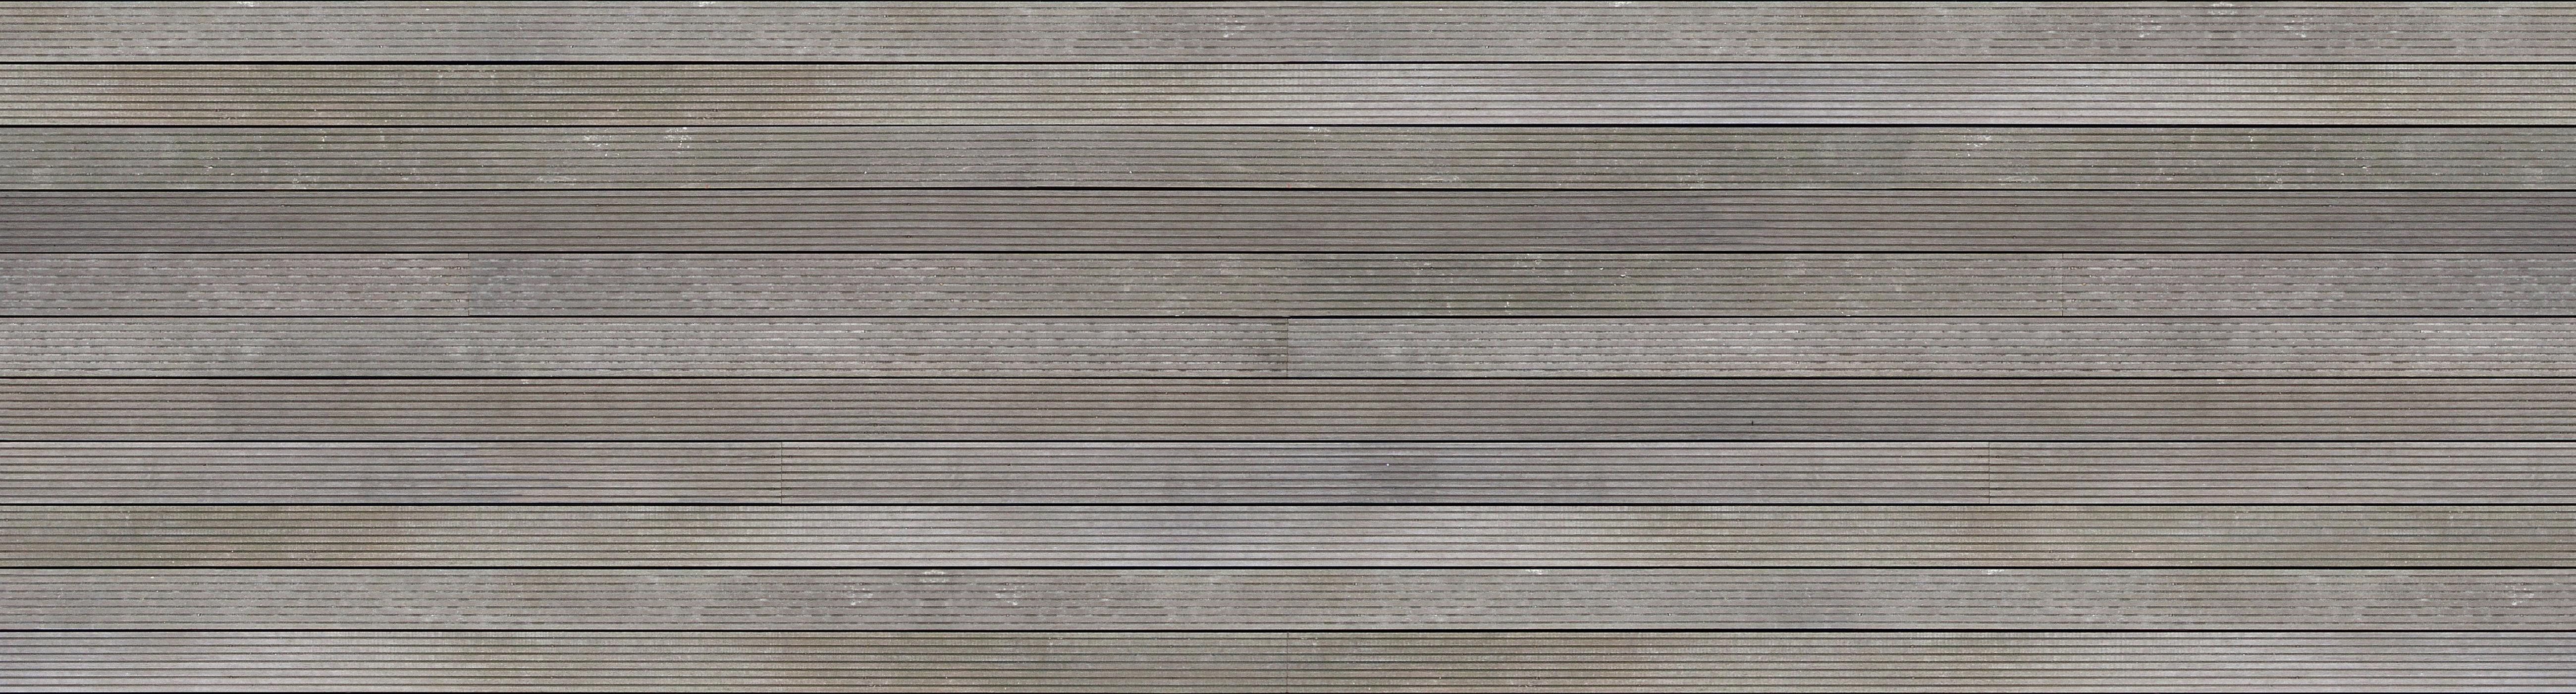 Fluidr free texture terrace floor boards bankirai wood for Terrace texture